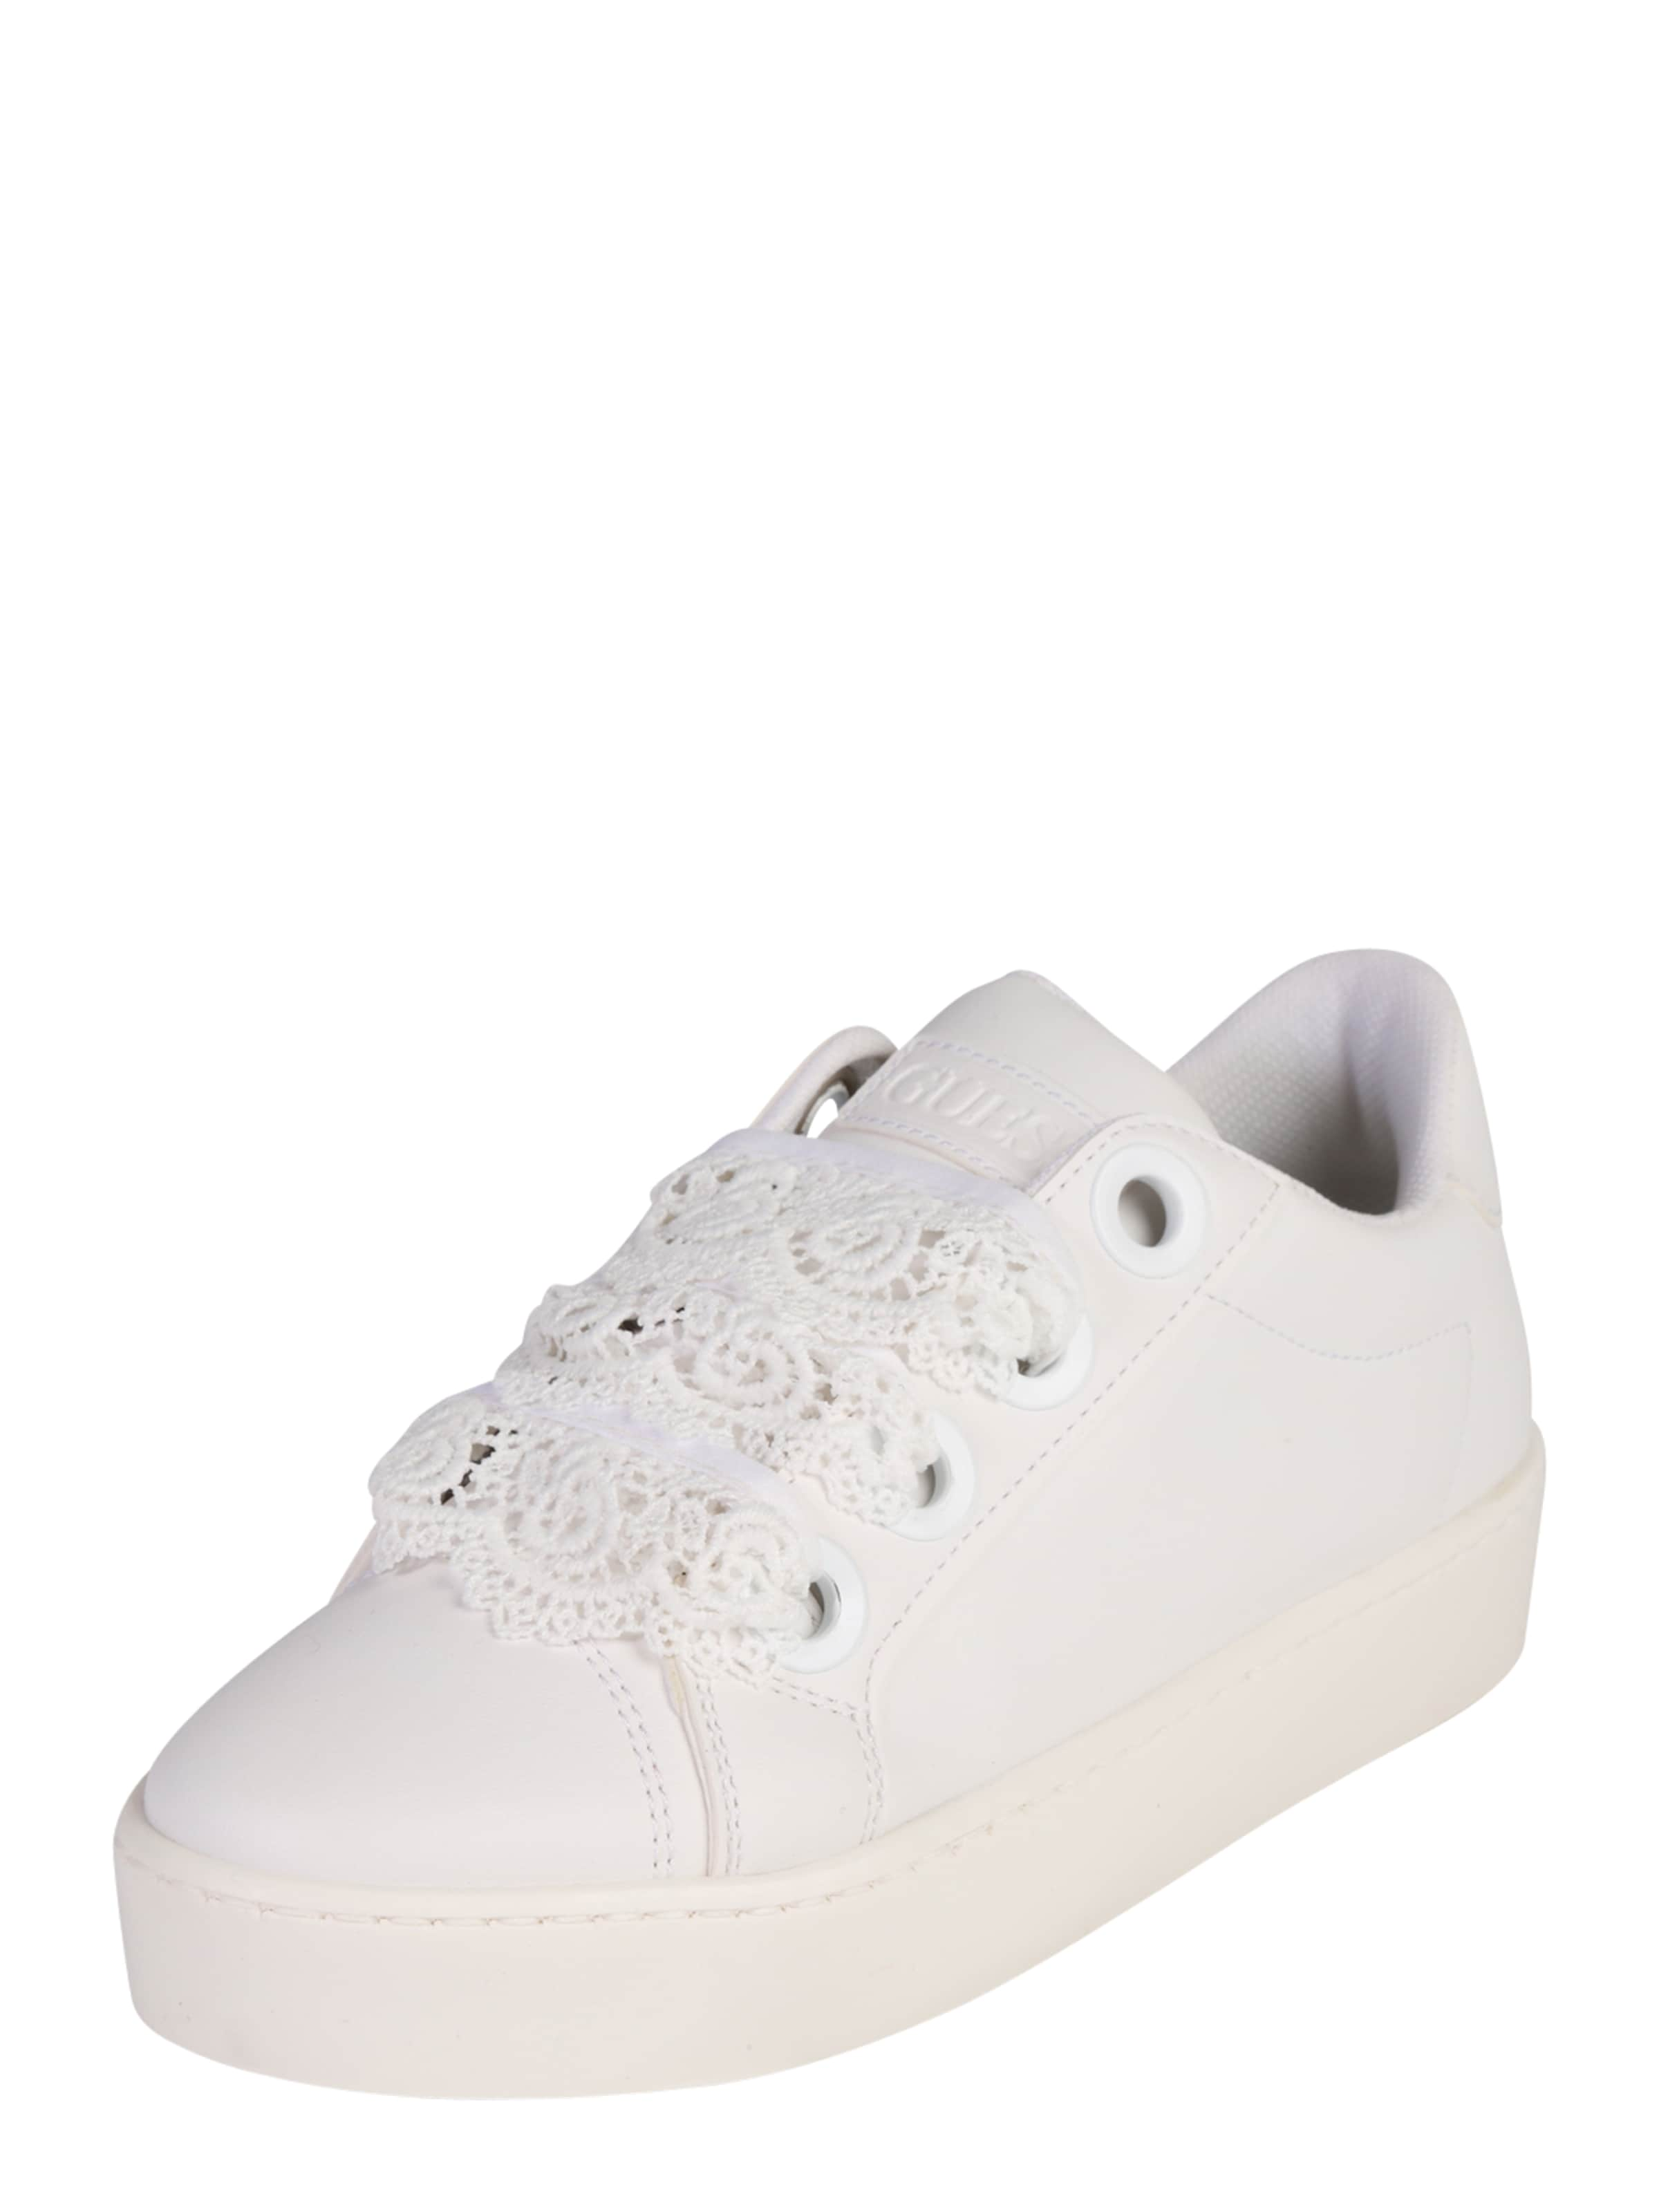 GUESS Sneaker URNY Verschleißfeste billige Schuhe